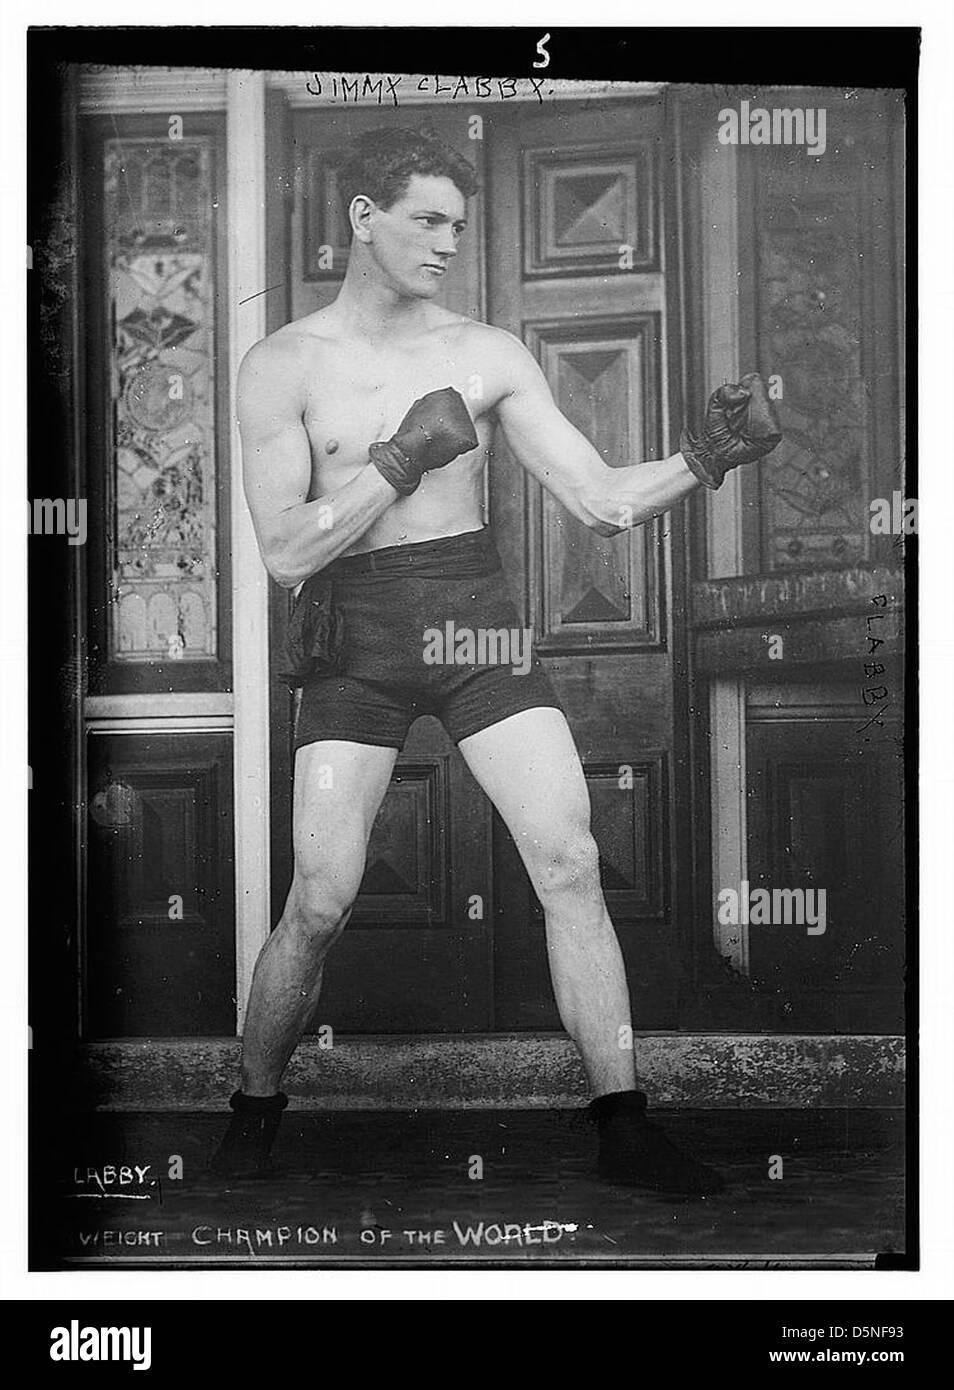 Jimmy Clabby. Boxeo (LOC) Imagen De Stock